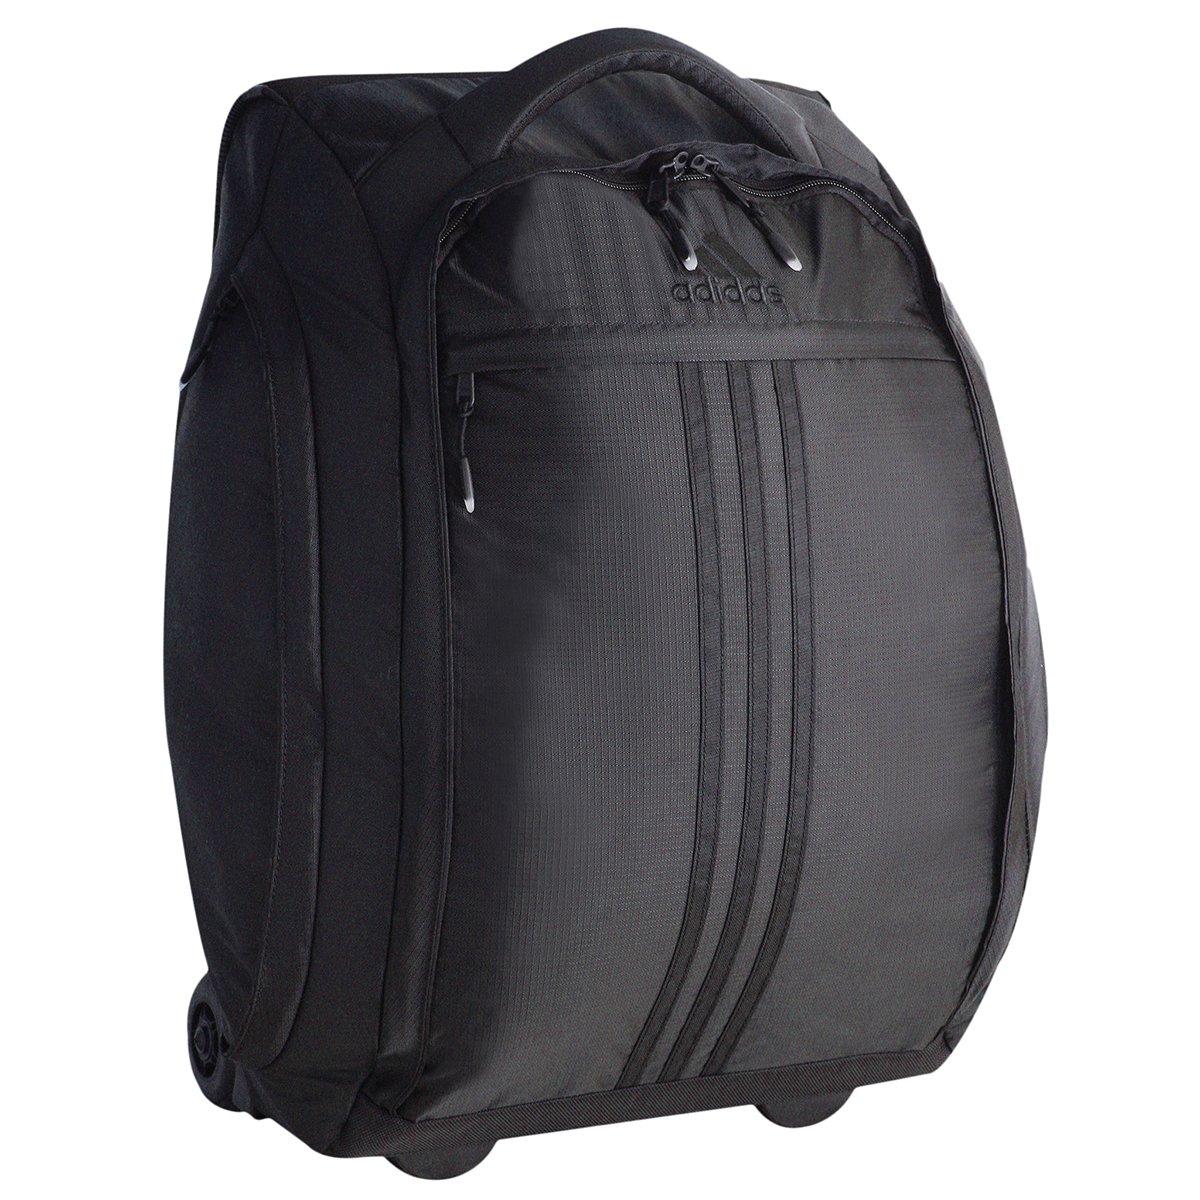 adidas Duel 21-Inch Wheel Bag, Black, One Size